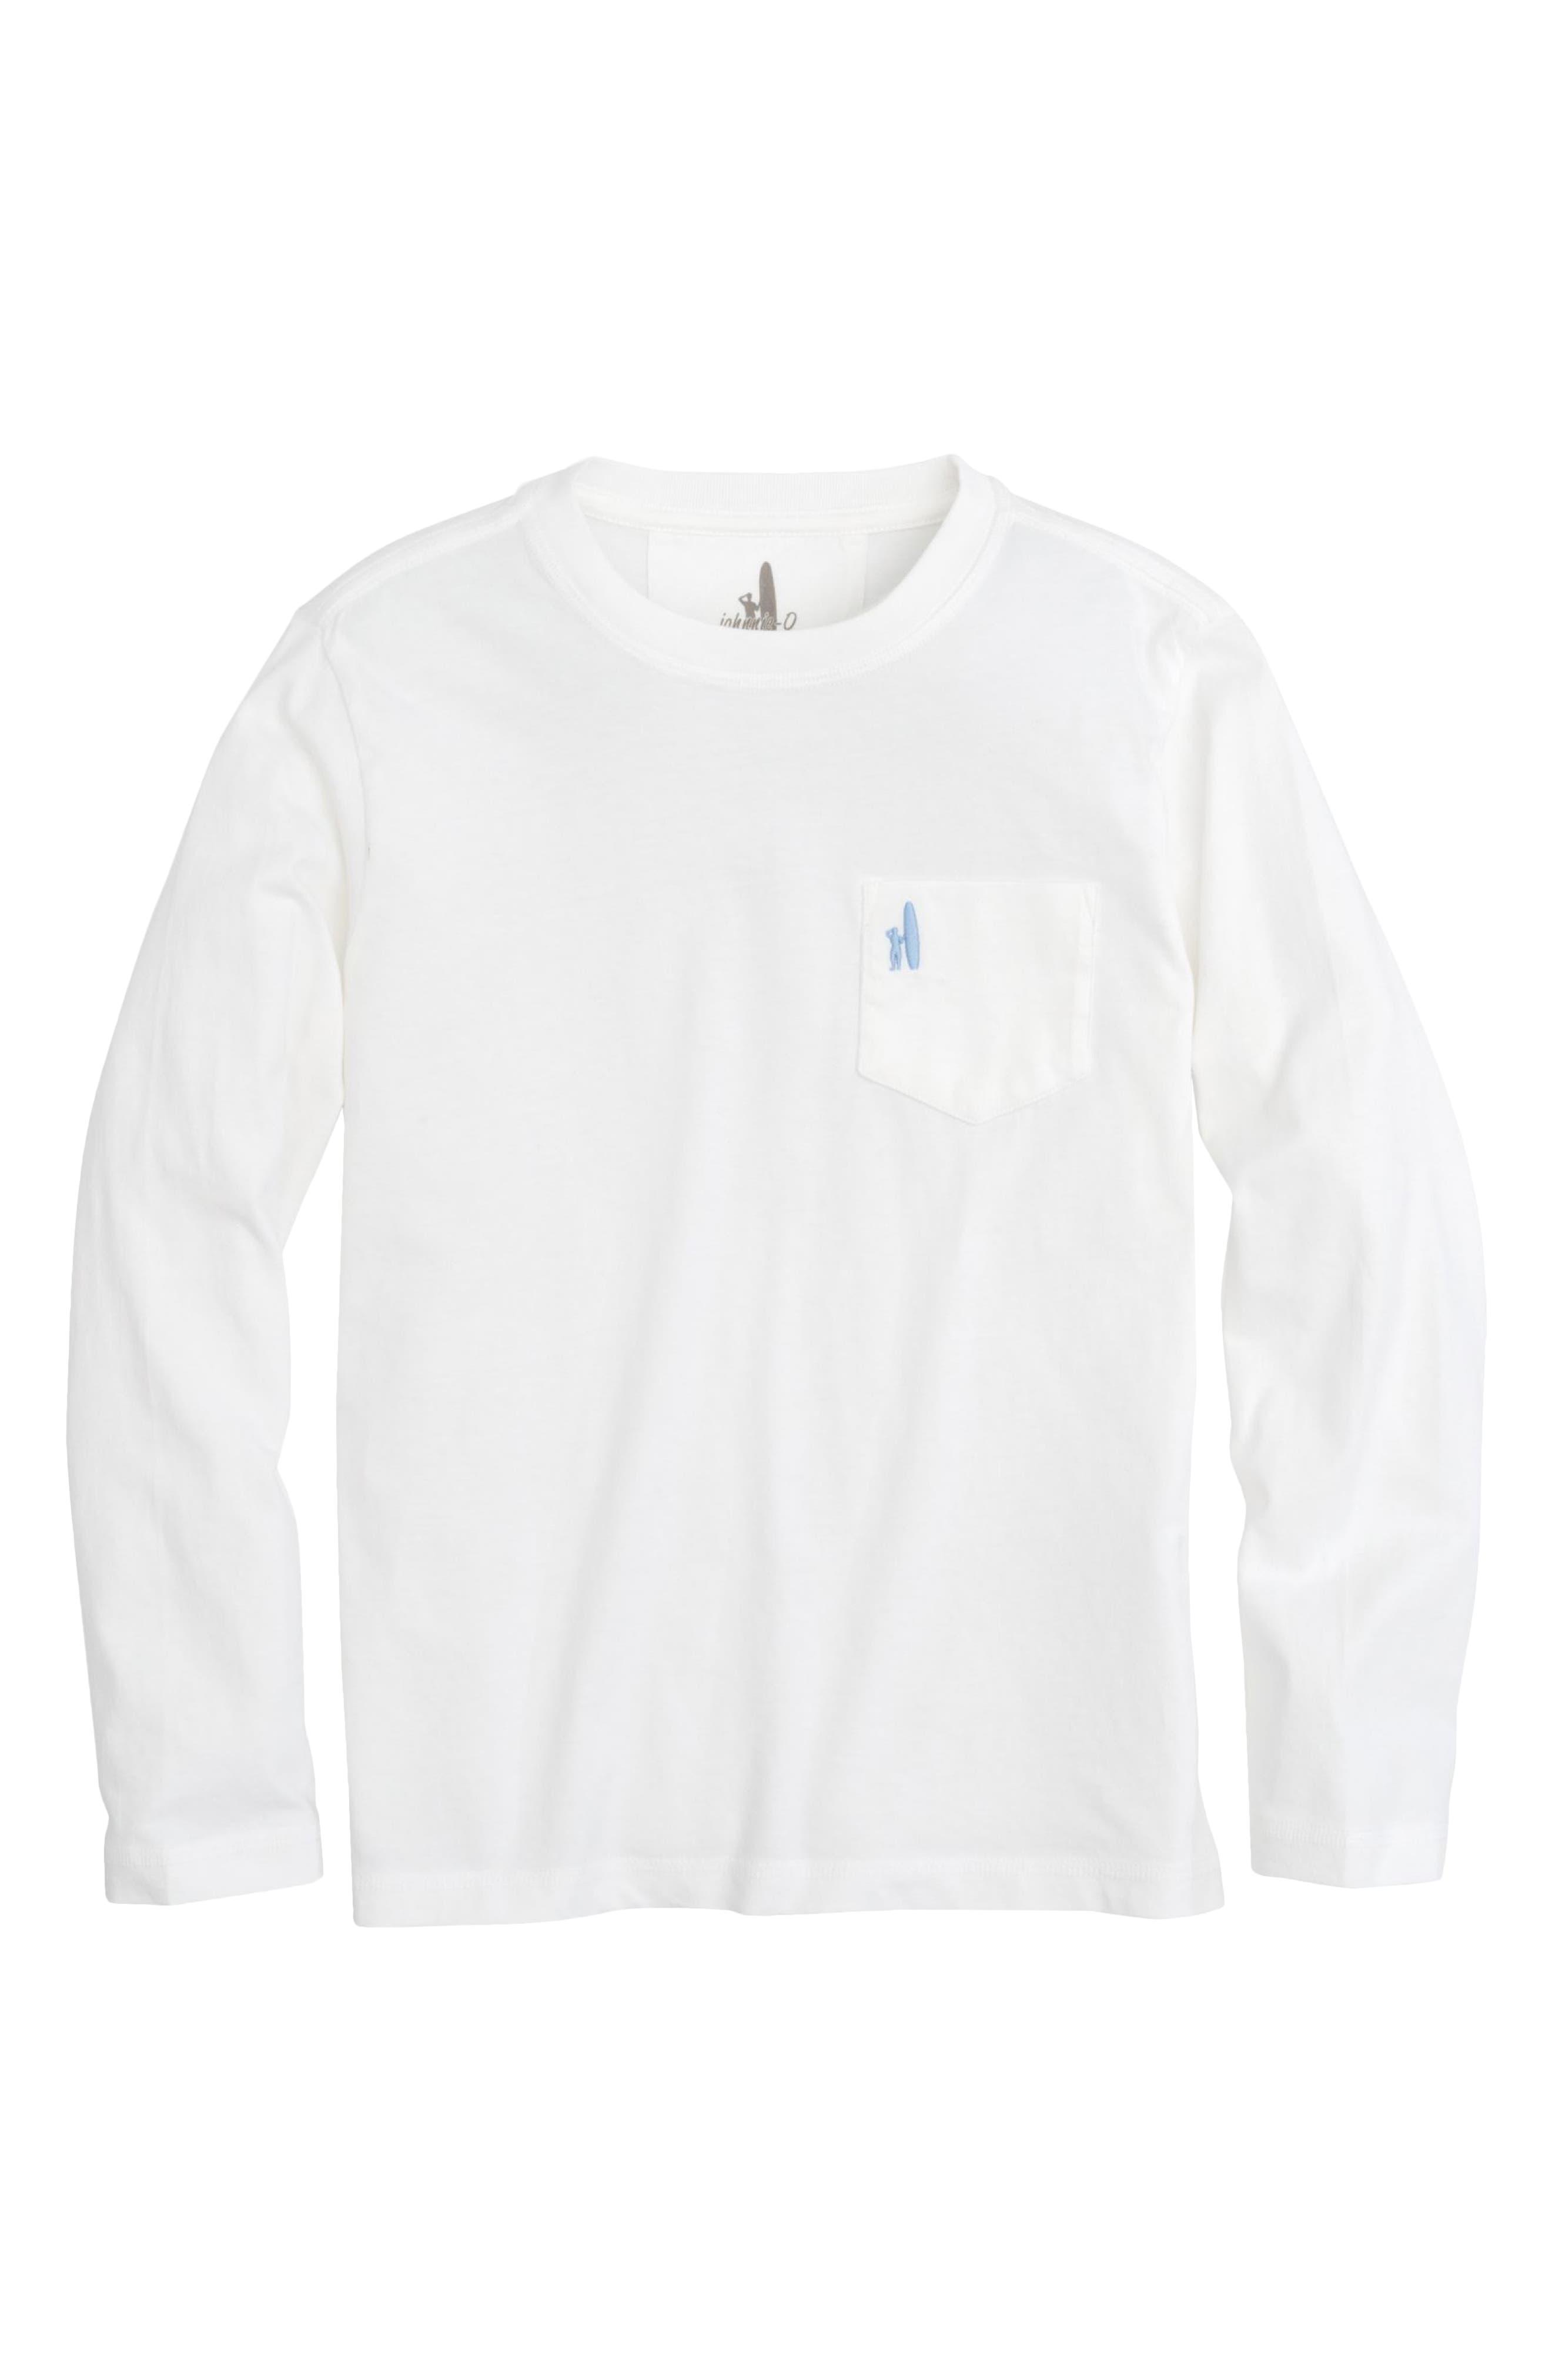 Top Top Boys /costa/ña/ Long Sleeve T-Shirt